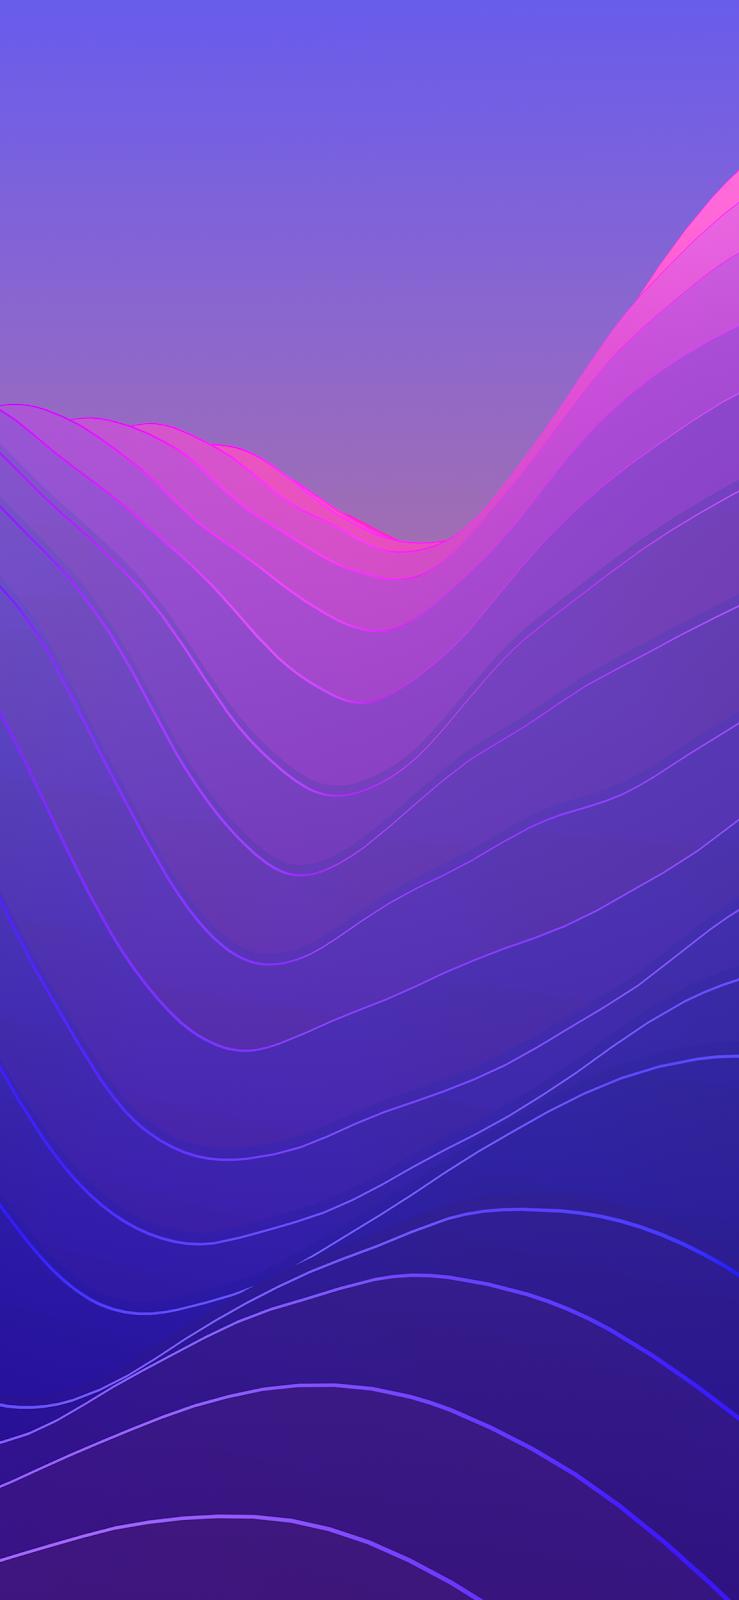 Oled Wallpaper Iphone X Iphone X 高解析度幾何幻想桌布下載 愛瘋日報 最精準的蘋果媒體